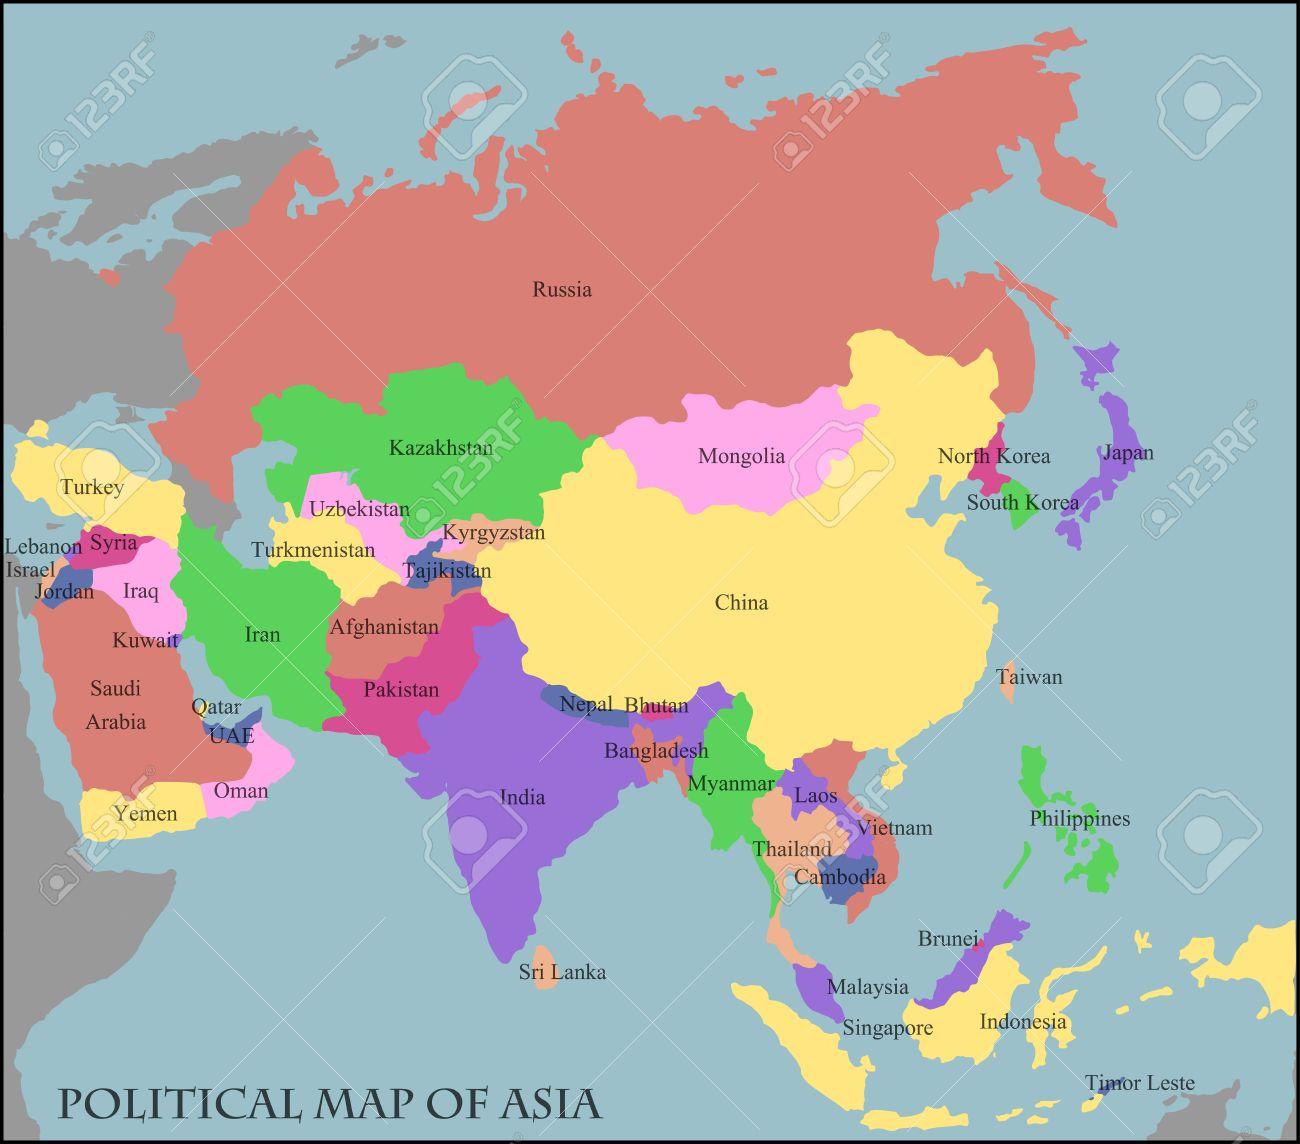 Mapa Político De Asia.Mapa Politico De Asia